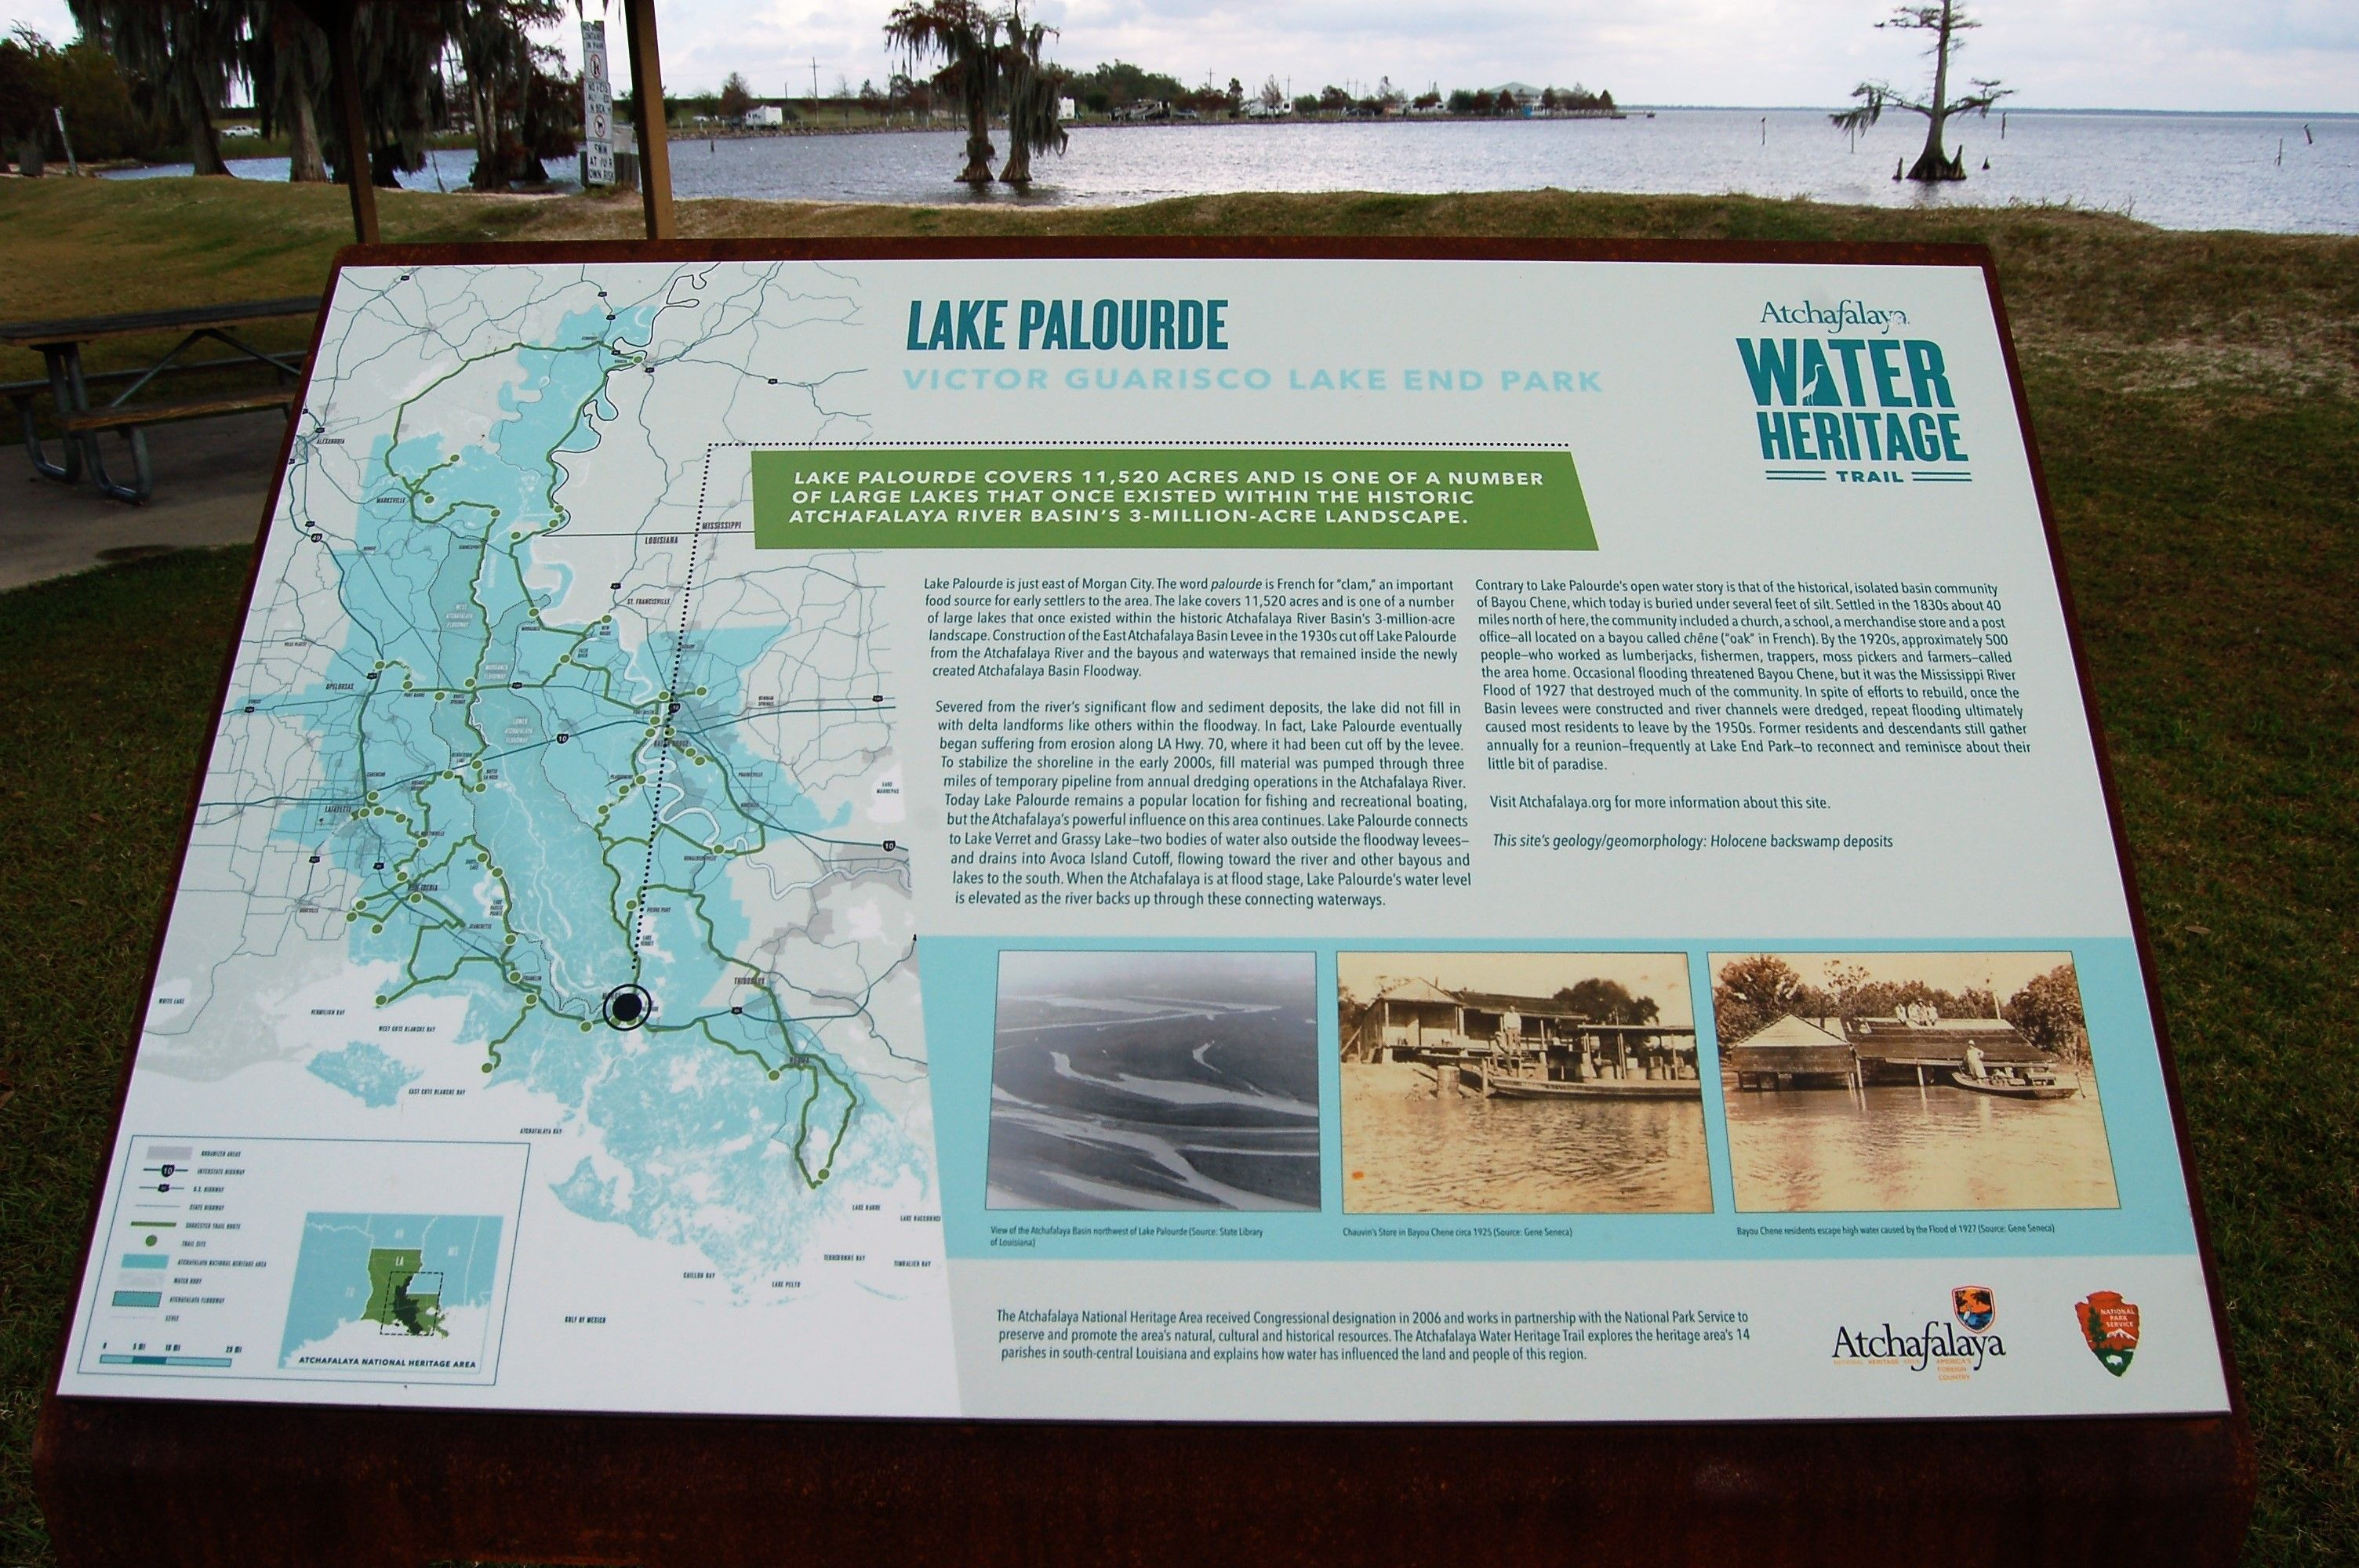 Lake Palourde Morgan City St Mary Parish Louisiana Morgan City Louisiana Parishes Lake